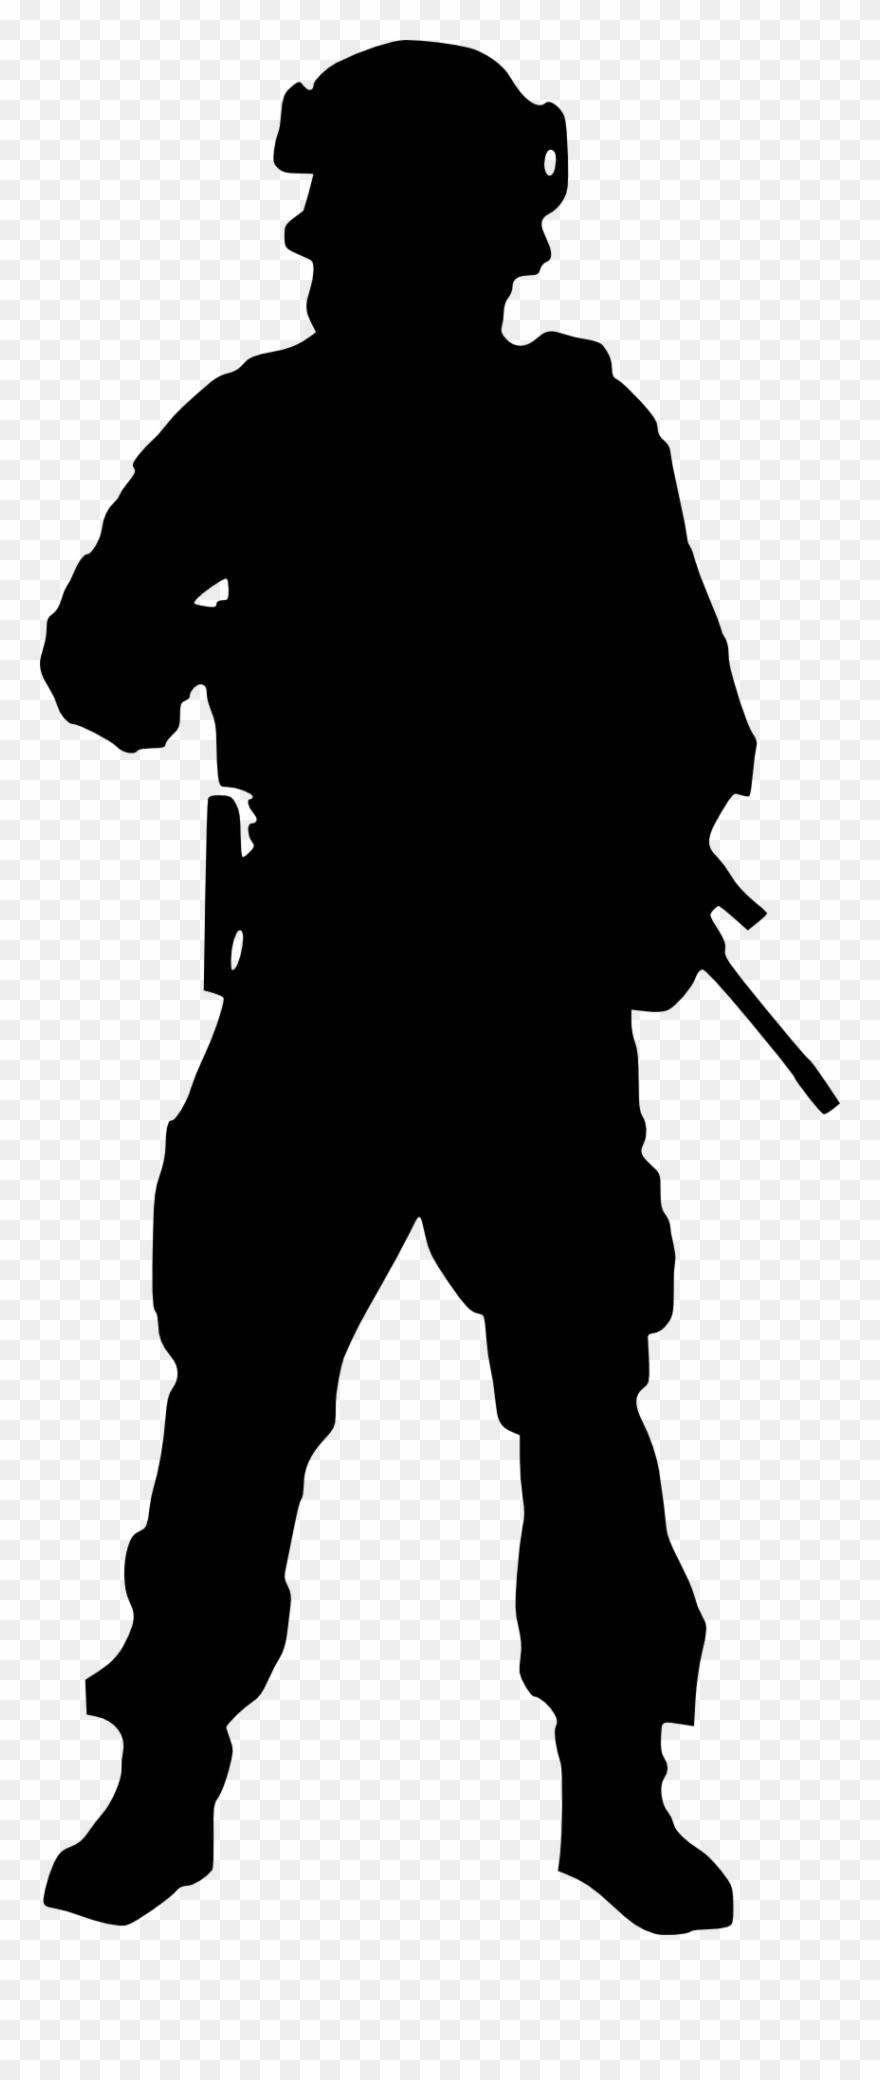 Running Soldier Silhouette.